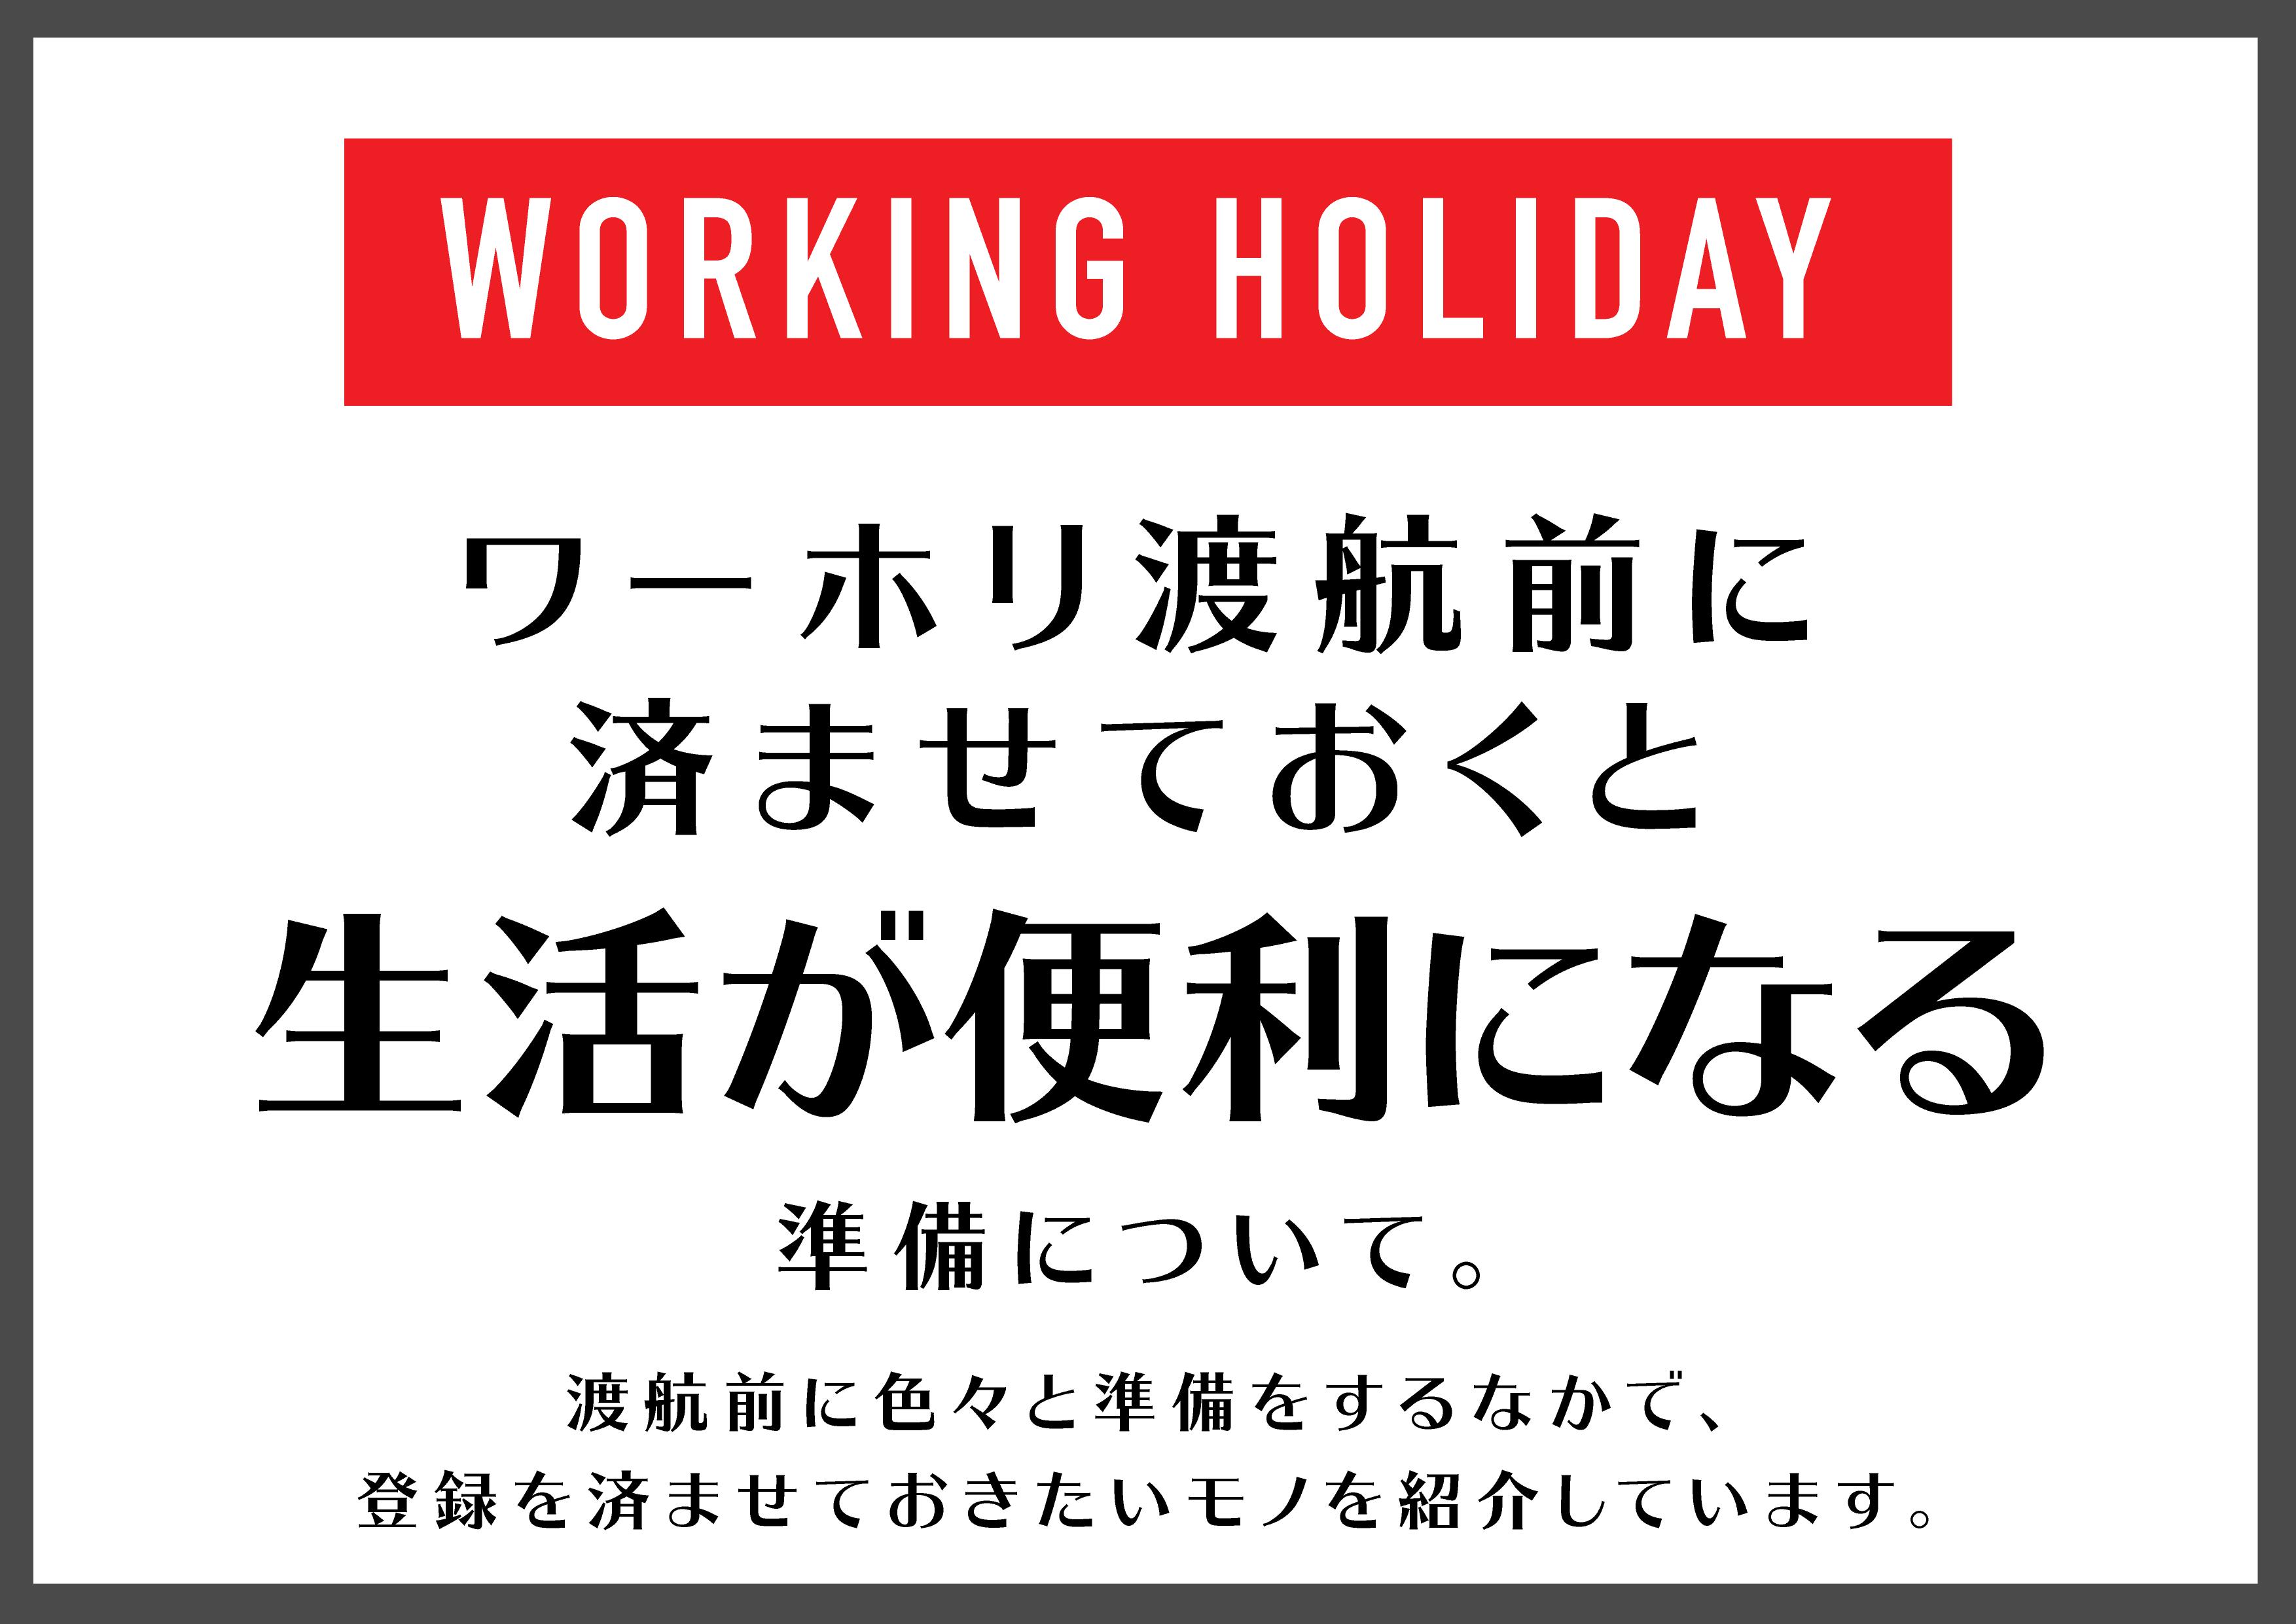 workingHolidaywsbd 01